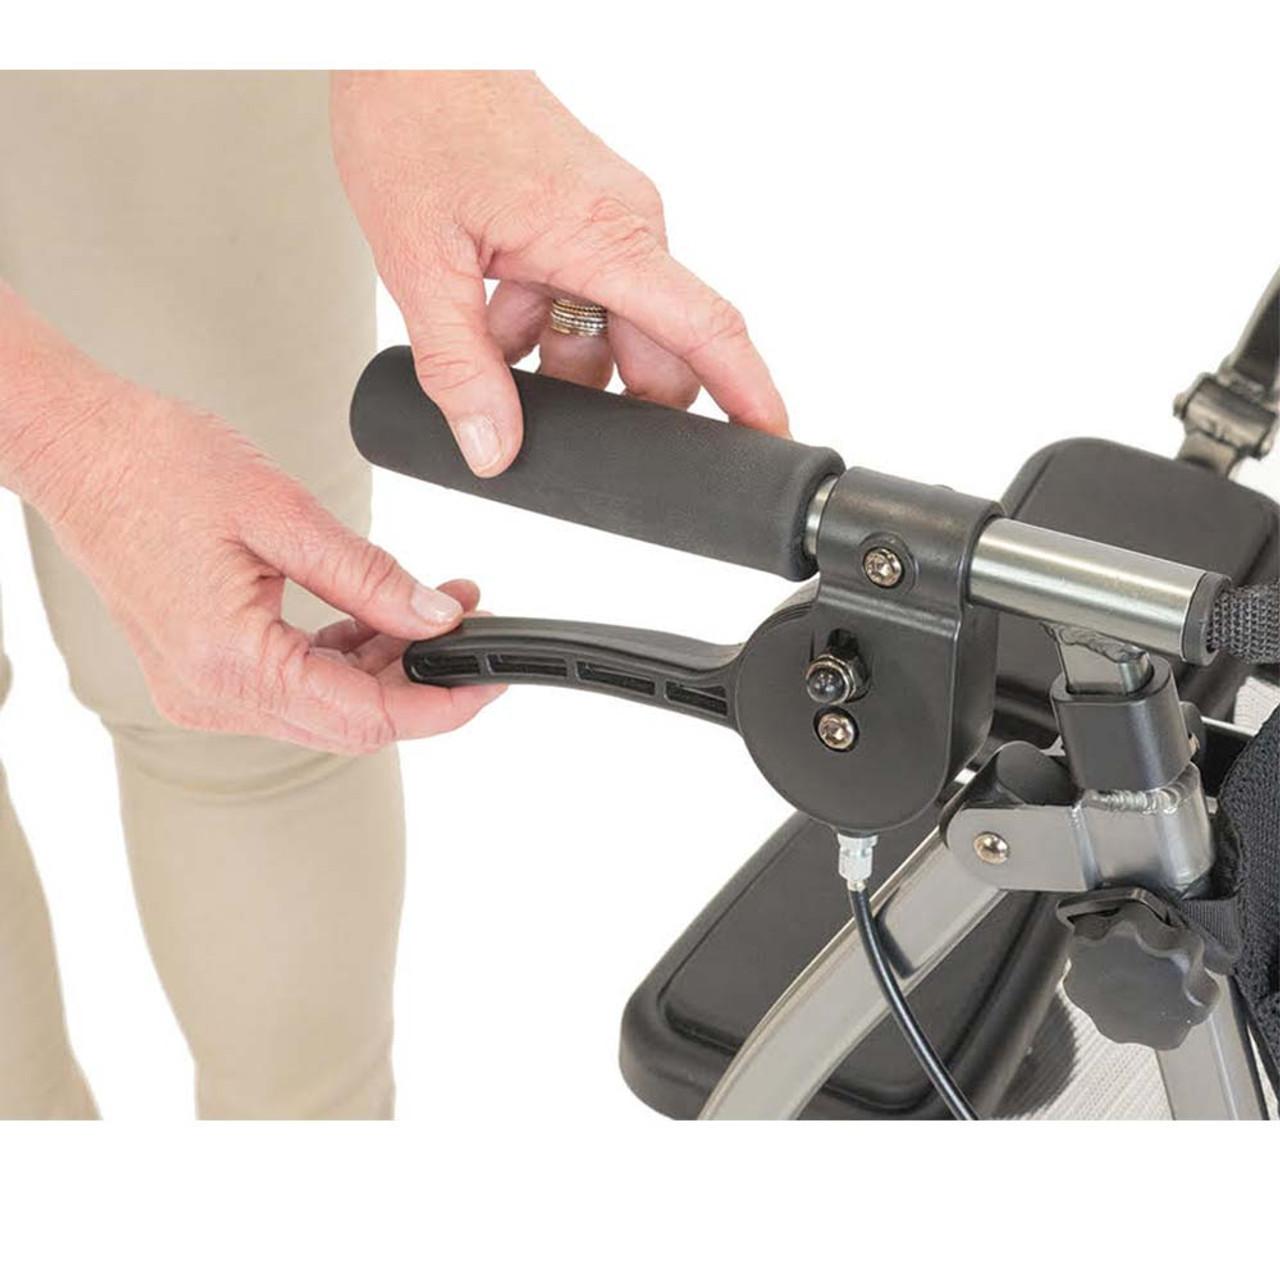 Portable Folding Mobility Walker MWPFL1  Brakes